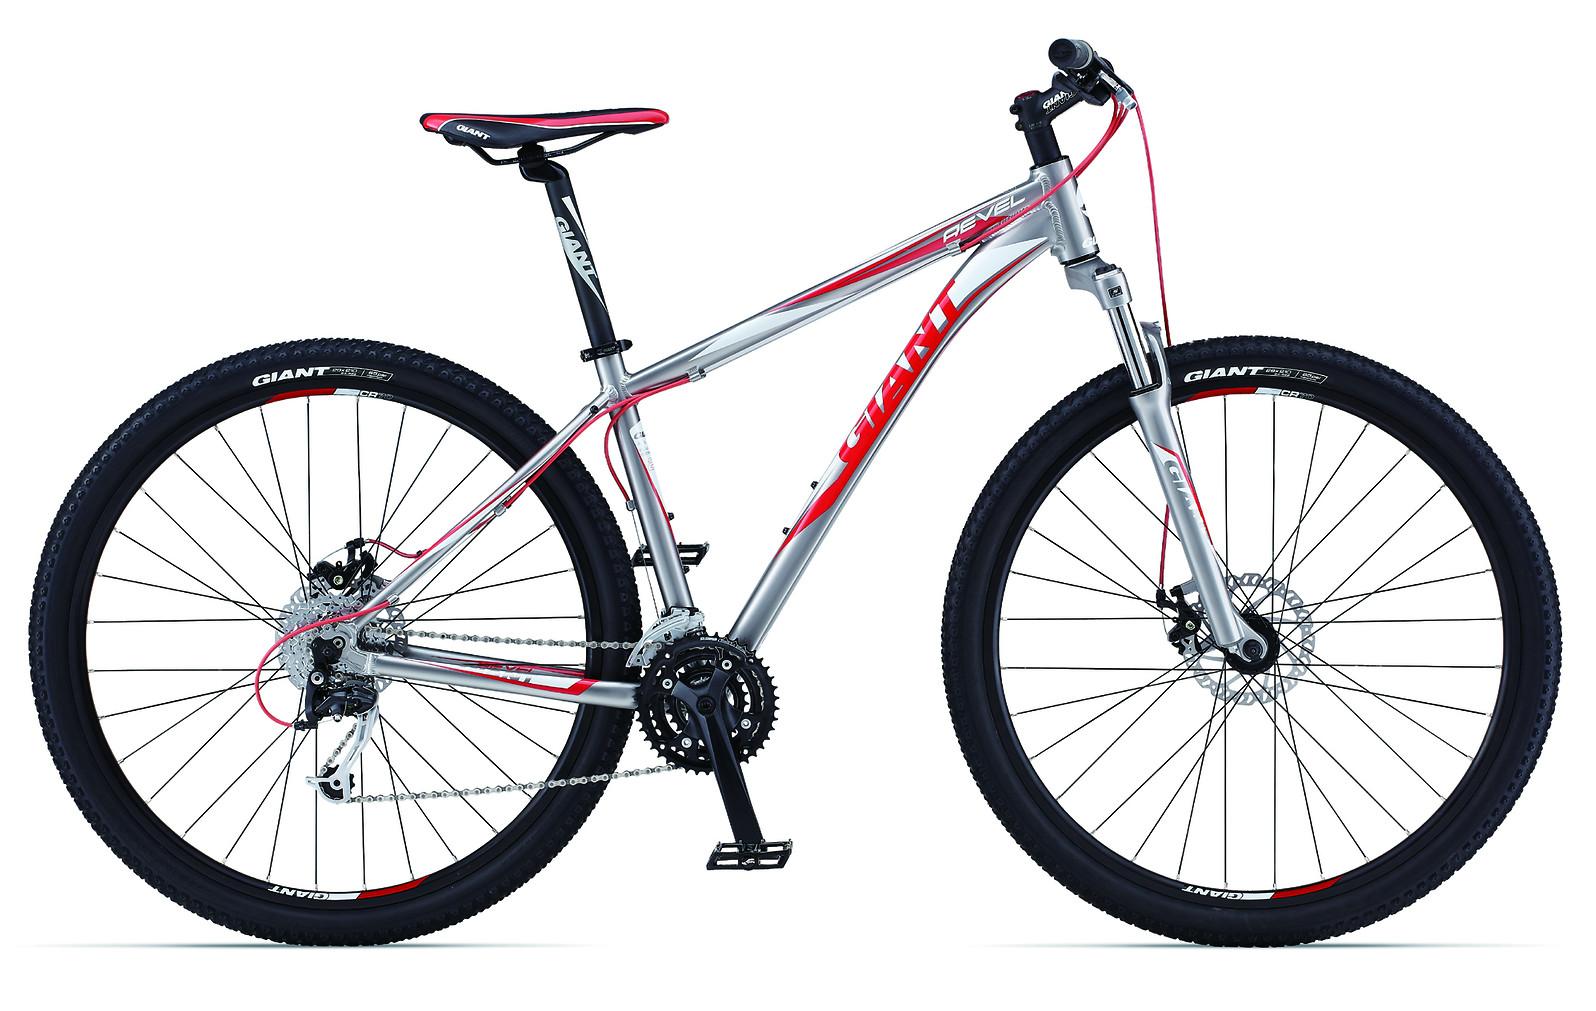 Continental Bike Tires >> 2013 Giant Revel 29er 1 Bike - Reviews, Comparisons, Specs - Mountain Bikes - Vital MTB